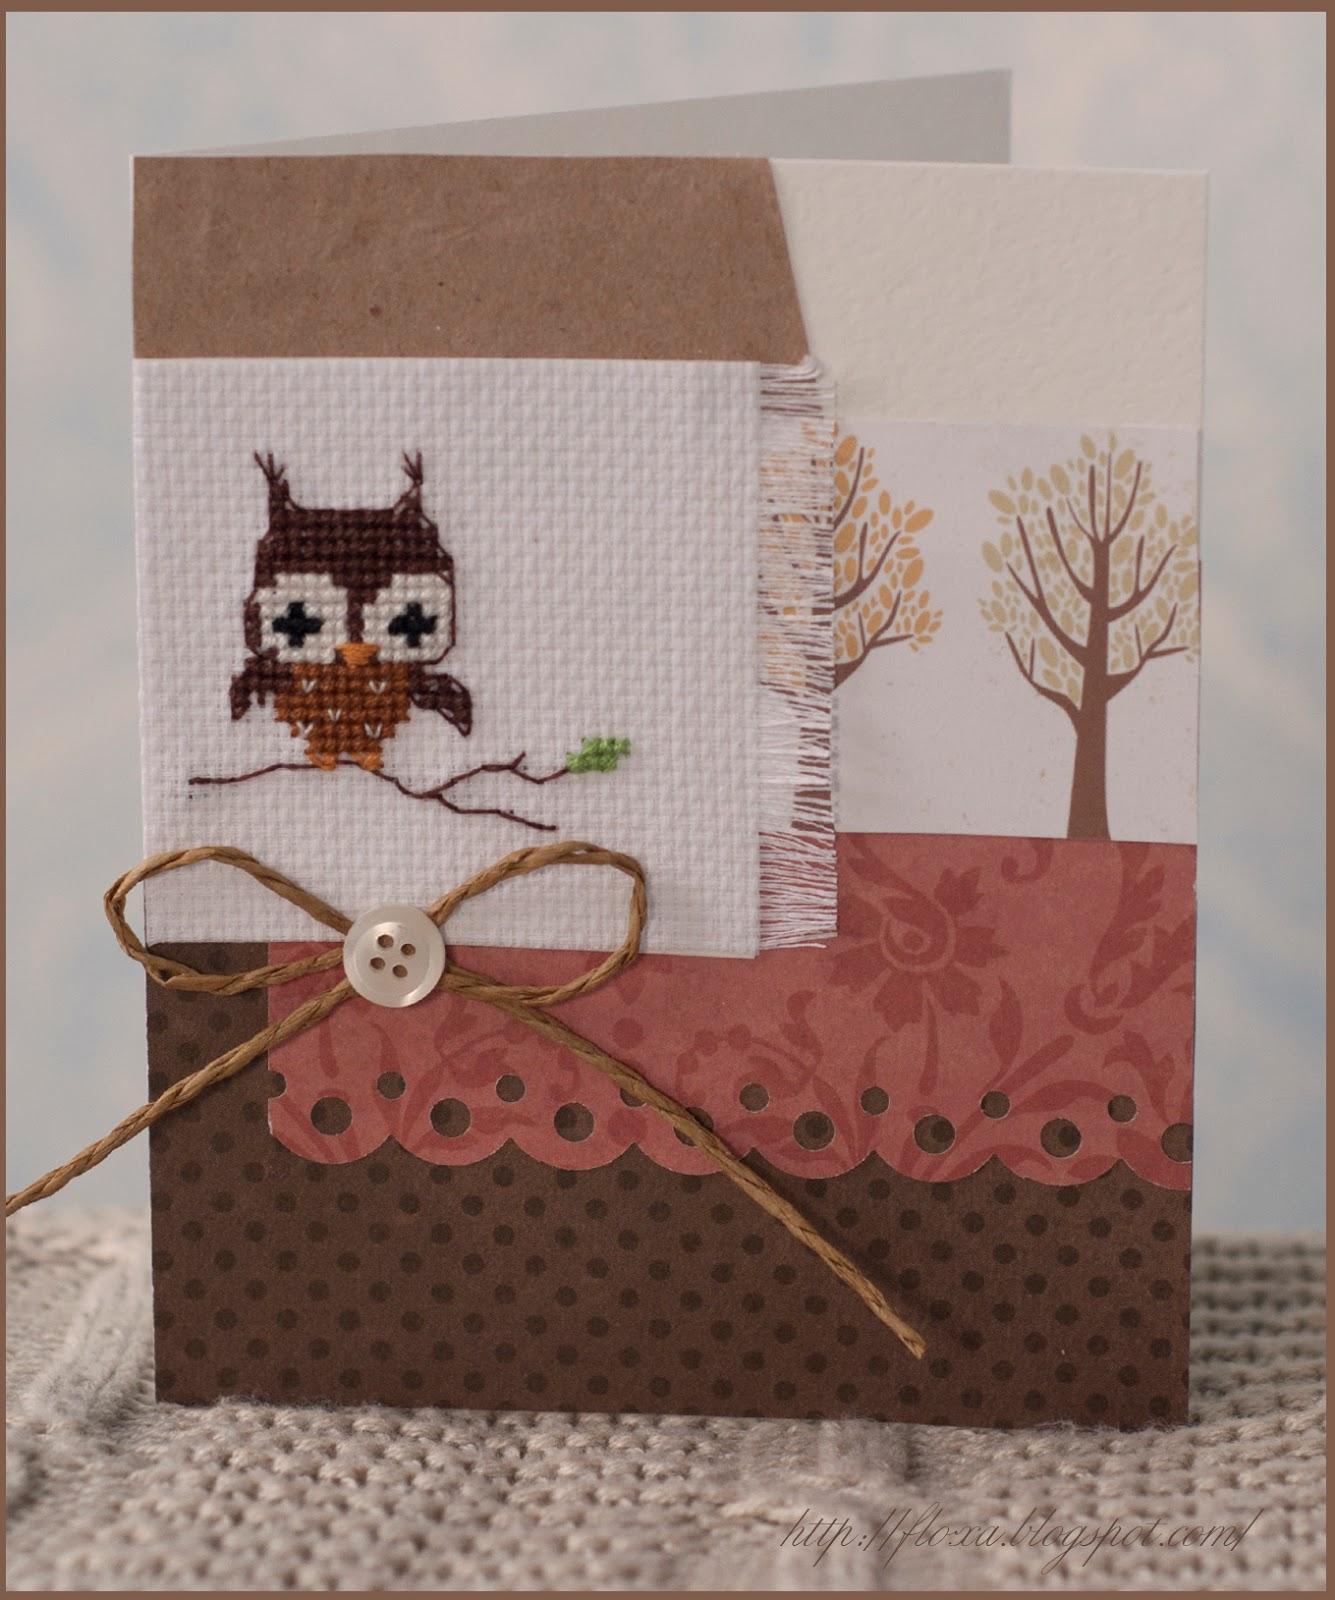 Christiane Dahlbeck,  Christiane Dahlbeck - Jahreszeiten. Herbst und Winter, вышивка сова, вышивка и скрапбукинг, вышивка искрап, вышивка сова маленькая, открытка с вышивкой, открытка осенняя